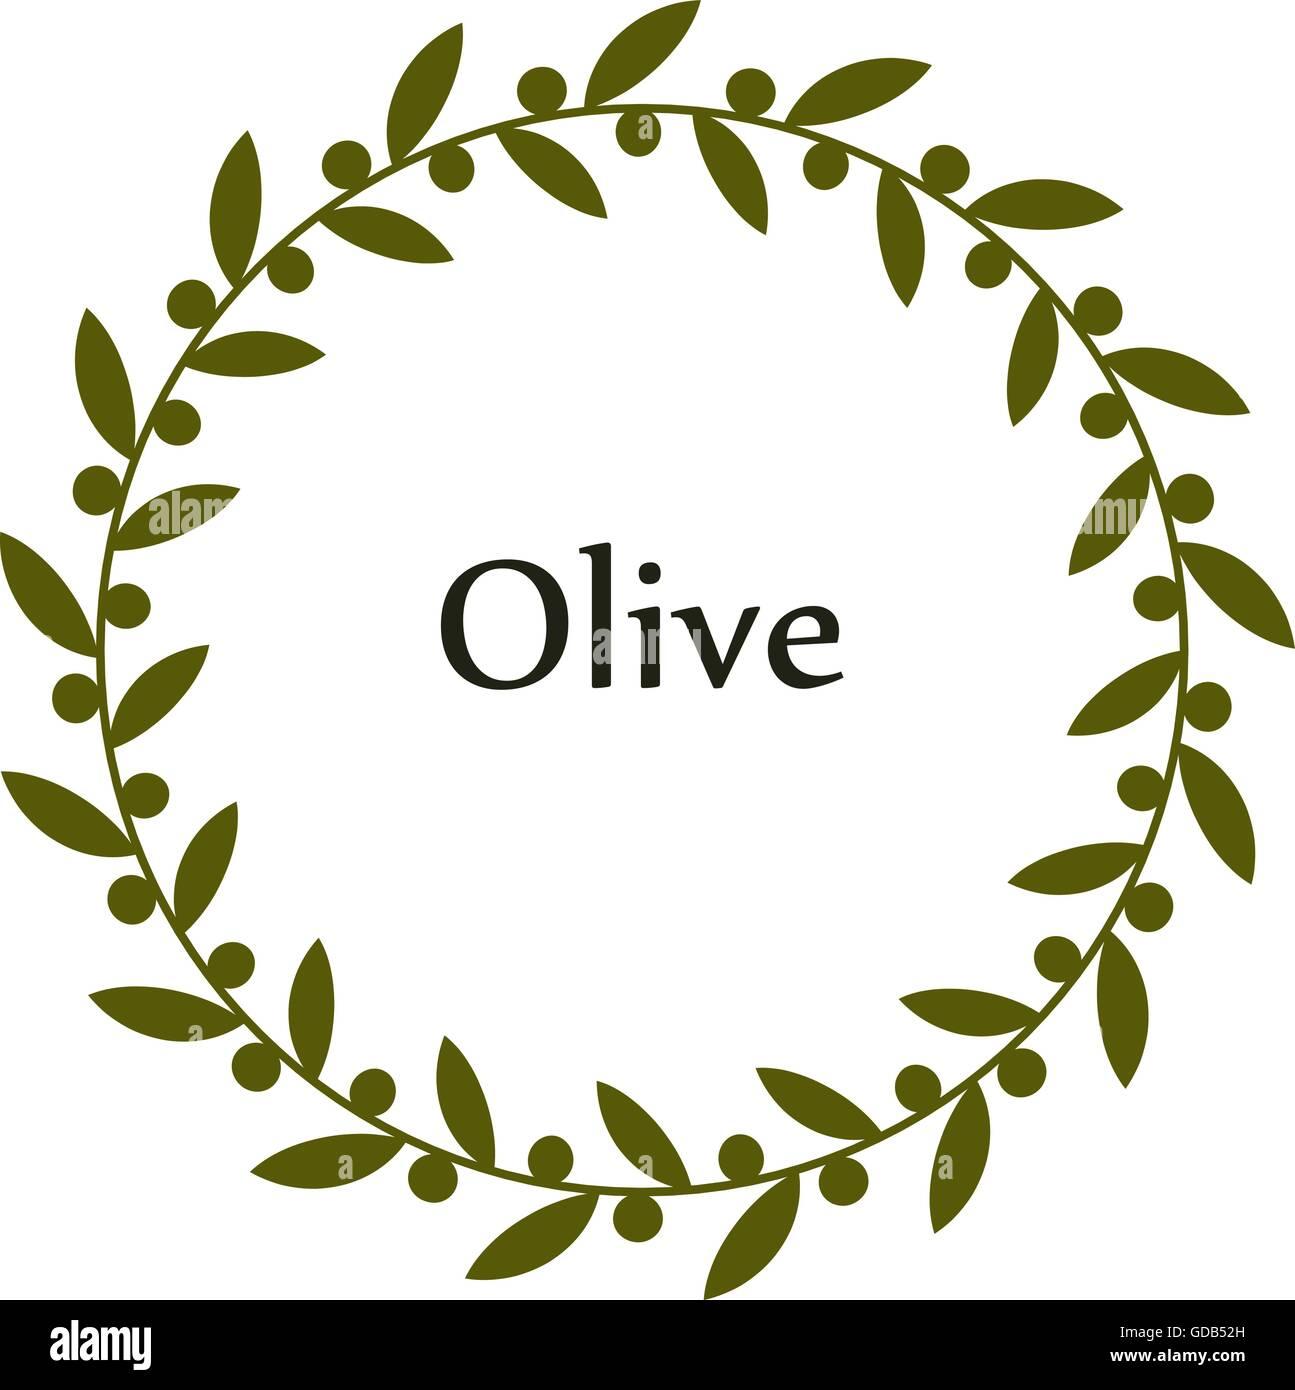 Isolated round green olive branch vector logo. Circlular shape. Olive oil sign. Symbol of peace. Greek mythology - Stock Image